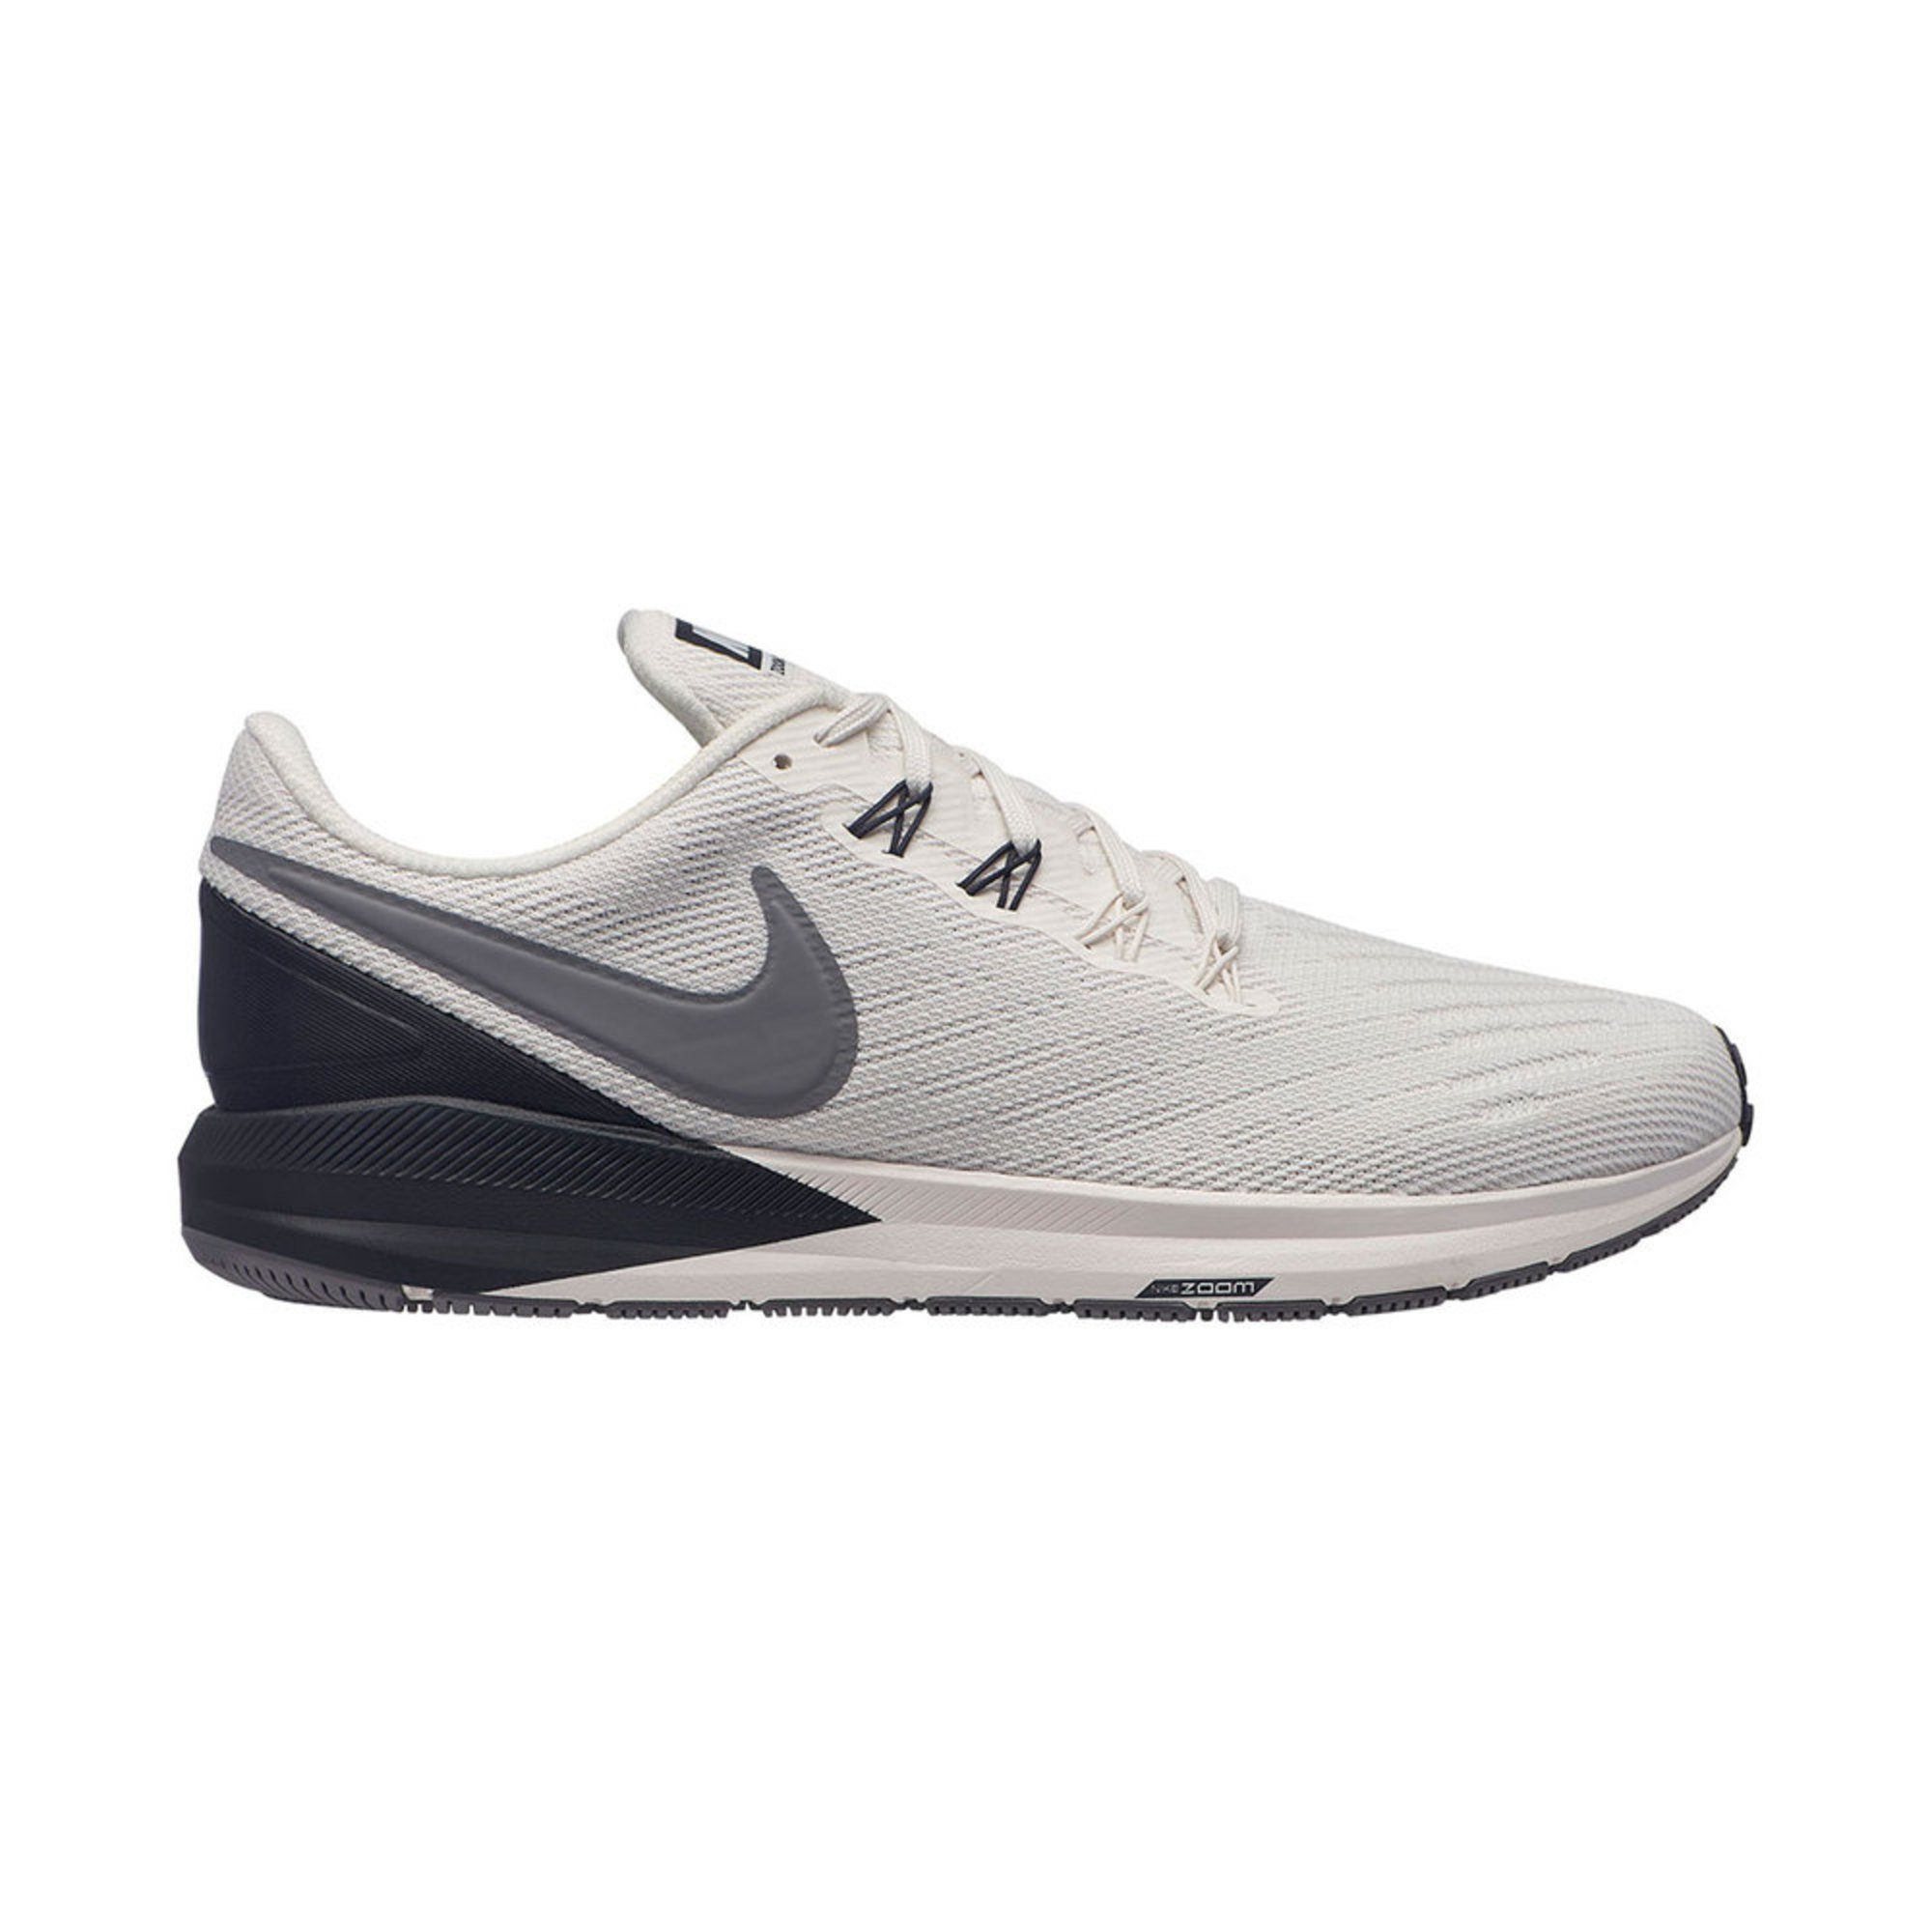 35d10b8054561 Nike. Nike Men s Air Zoom Structure 22 Running Shoe